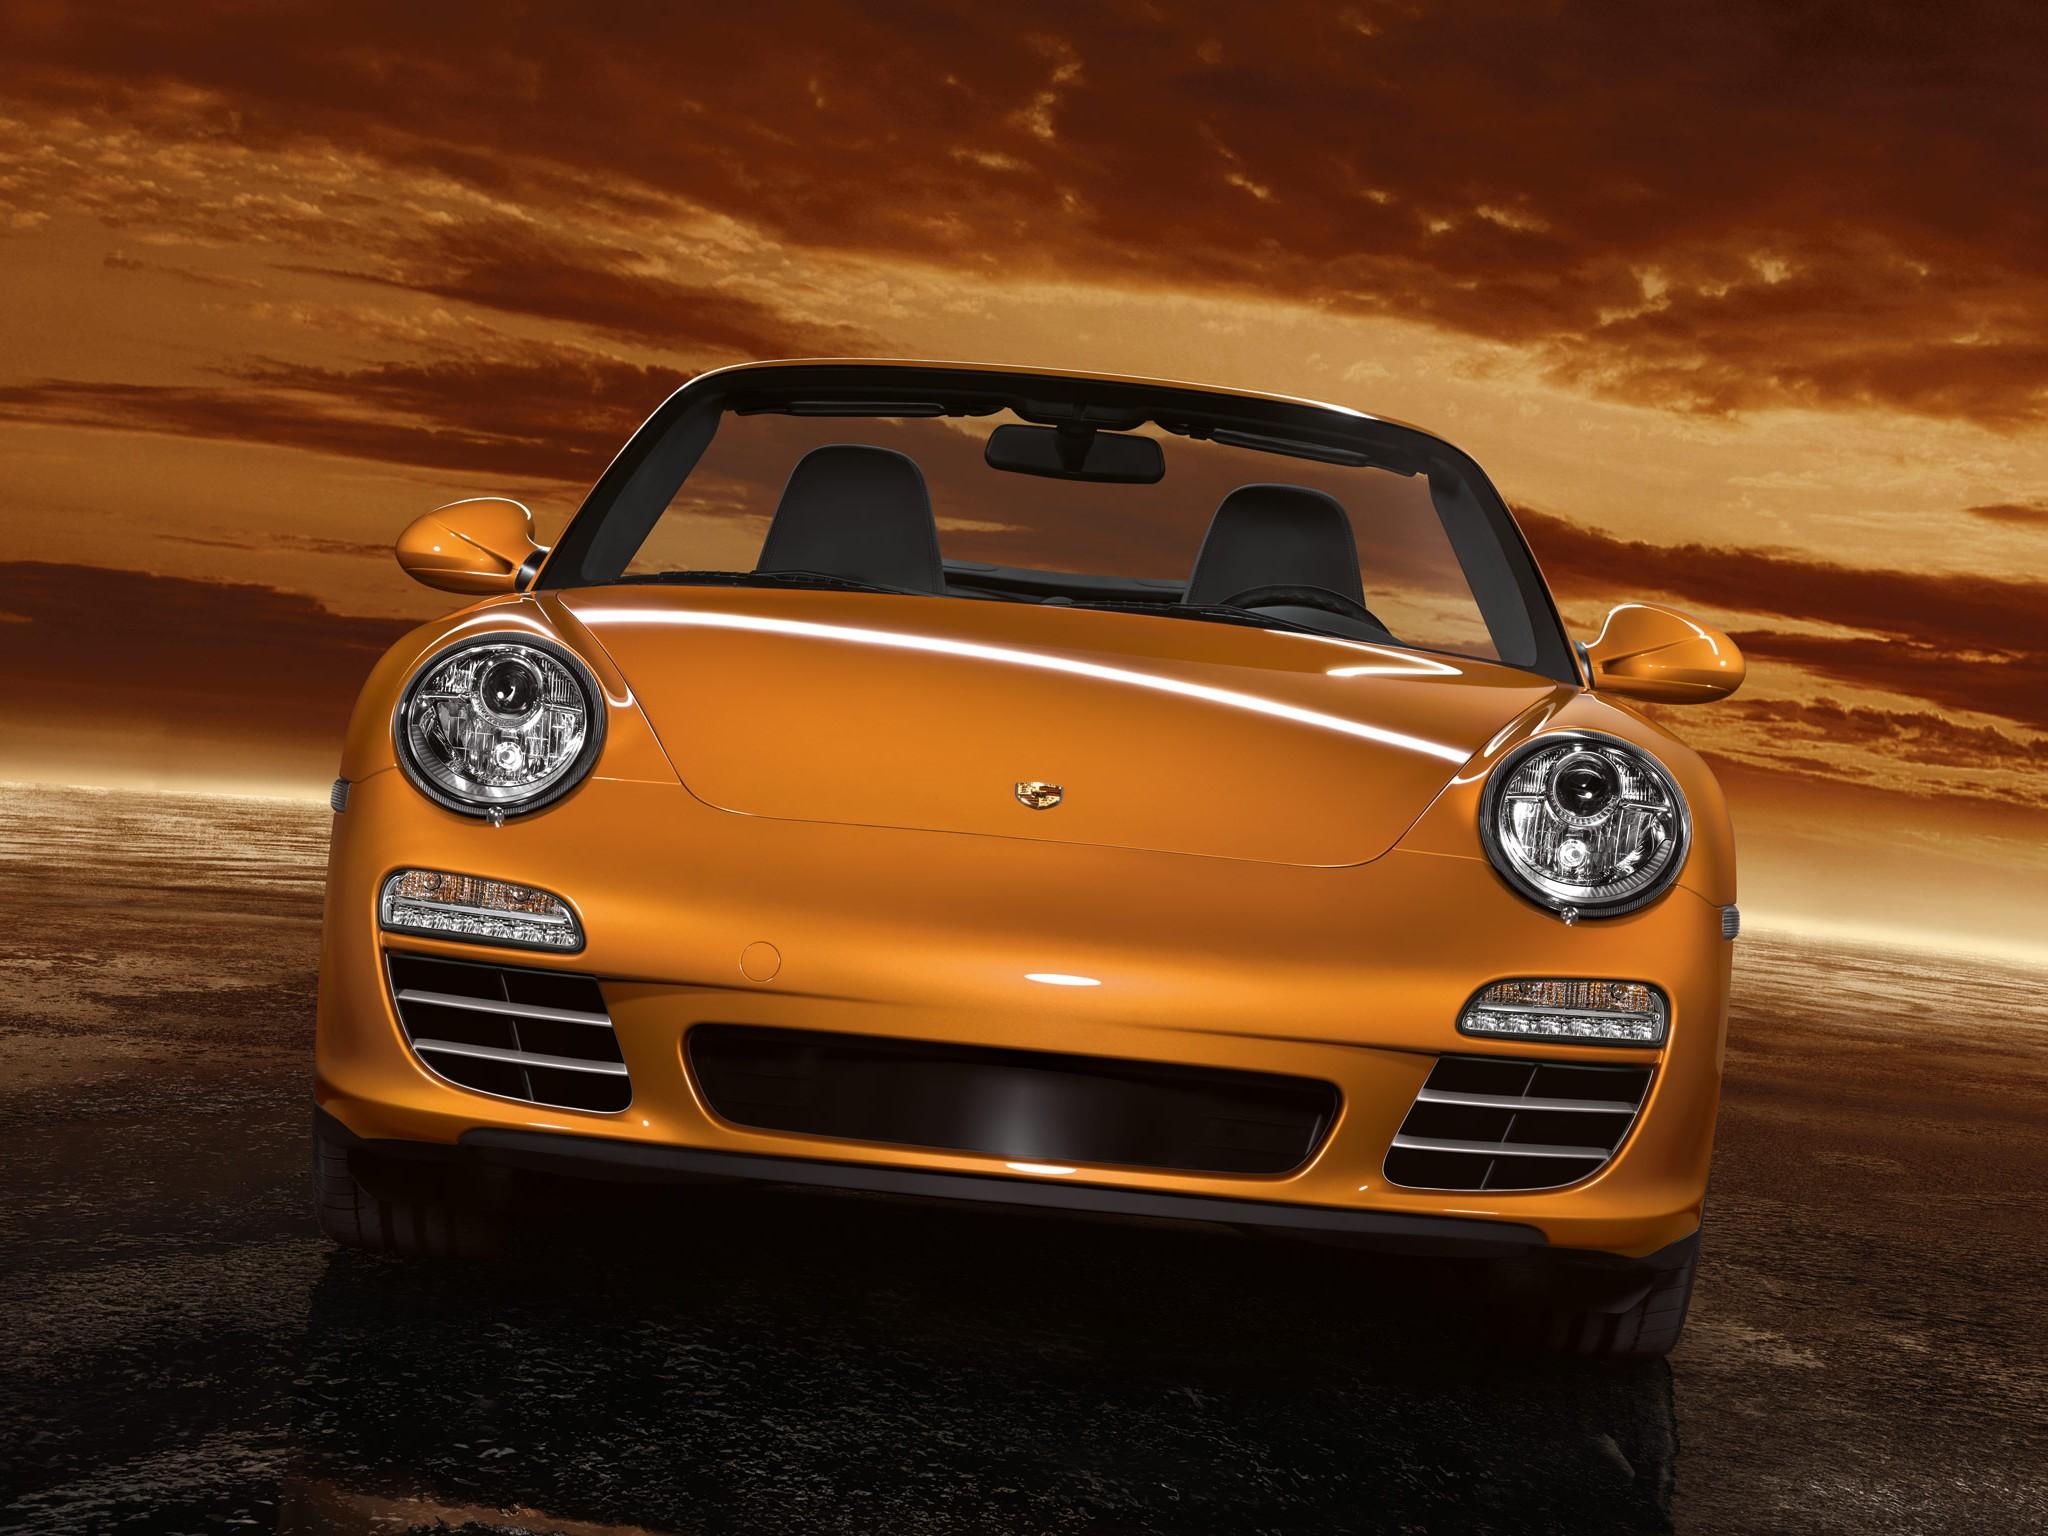 2010 Porsche 911 Carrera 4 Cabriolet photo - 2